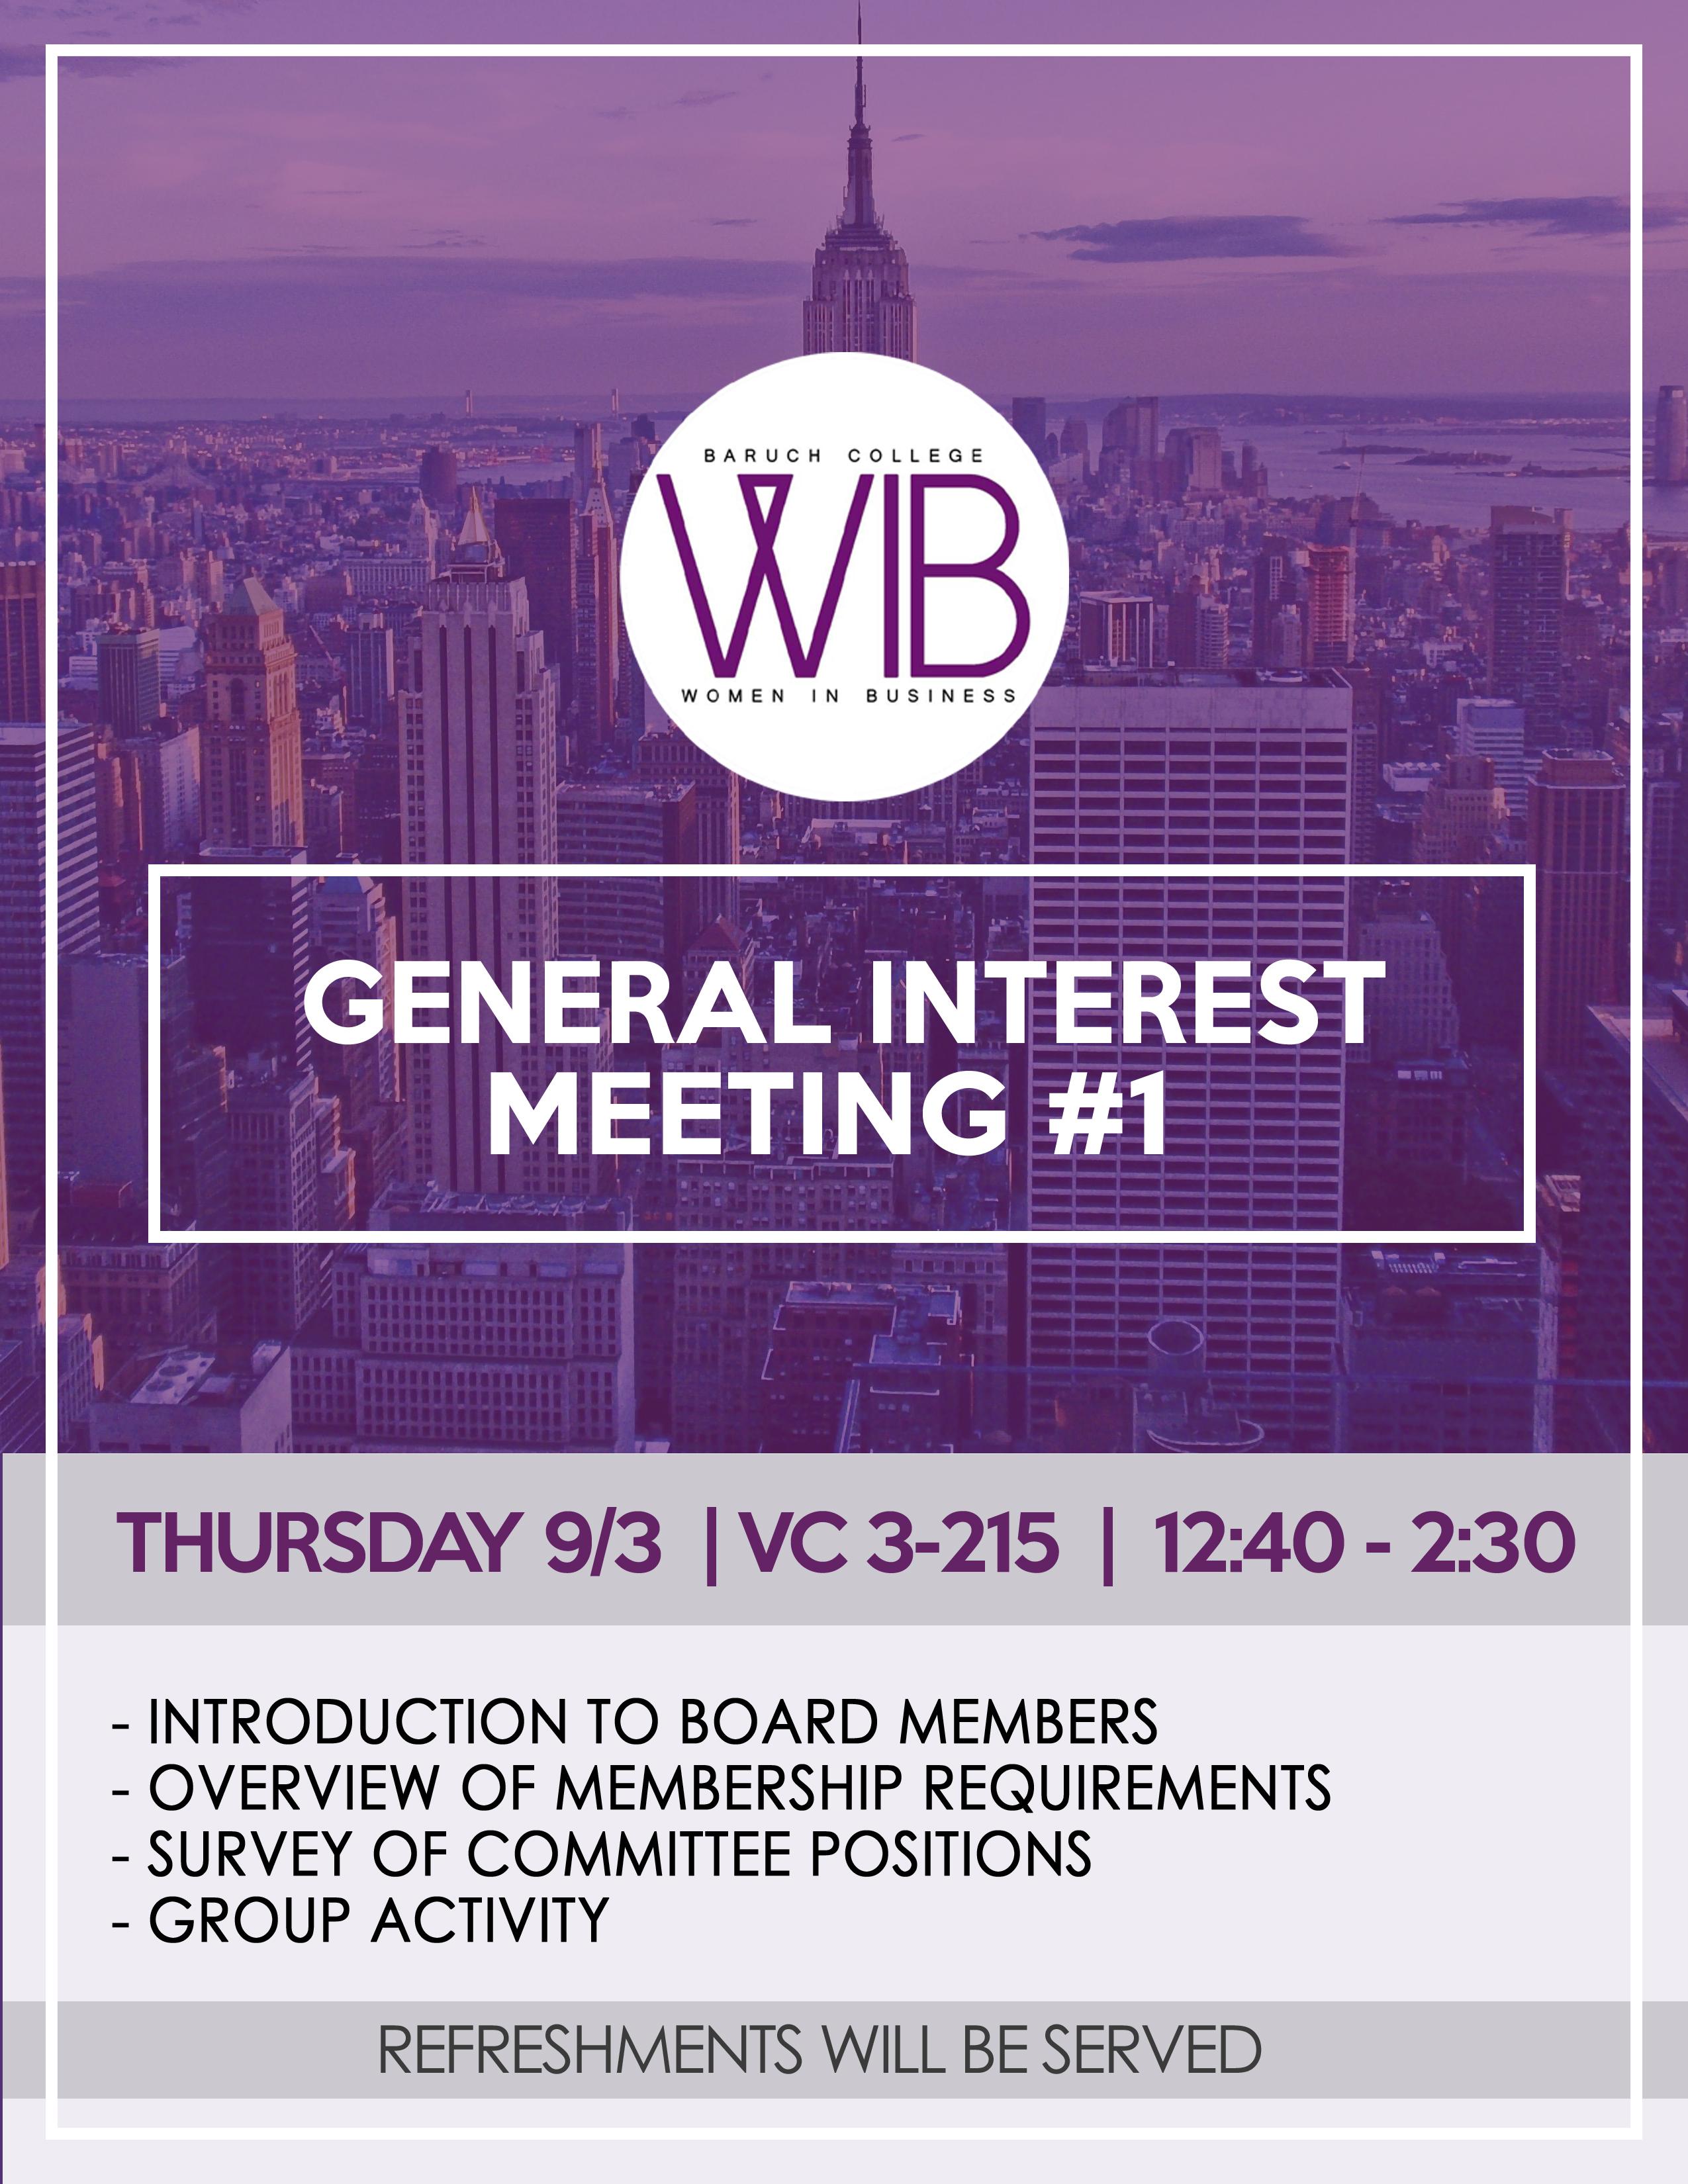 General Interest Meeting #1